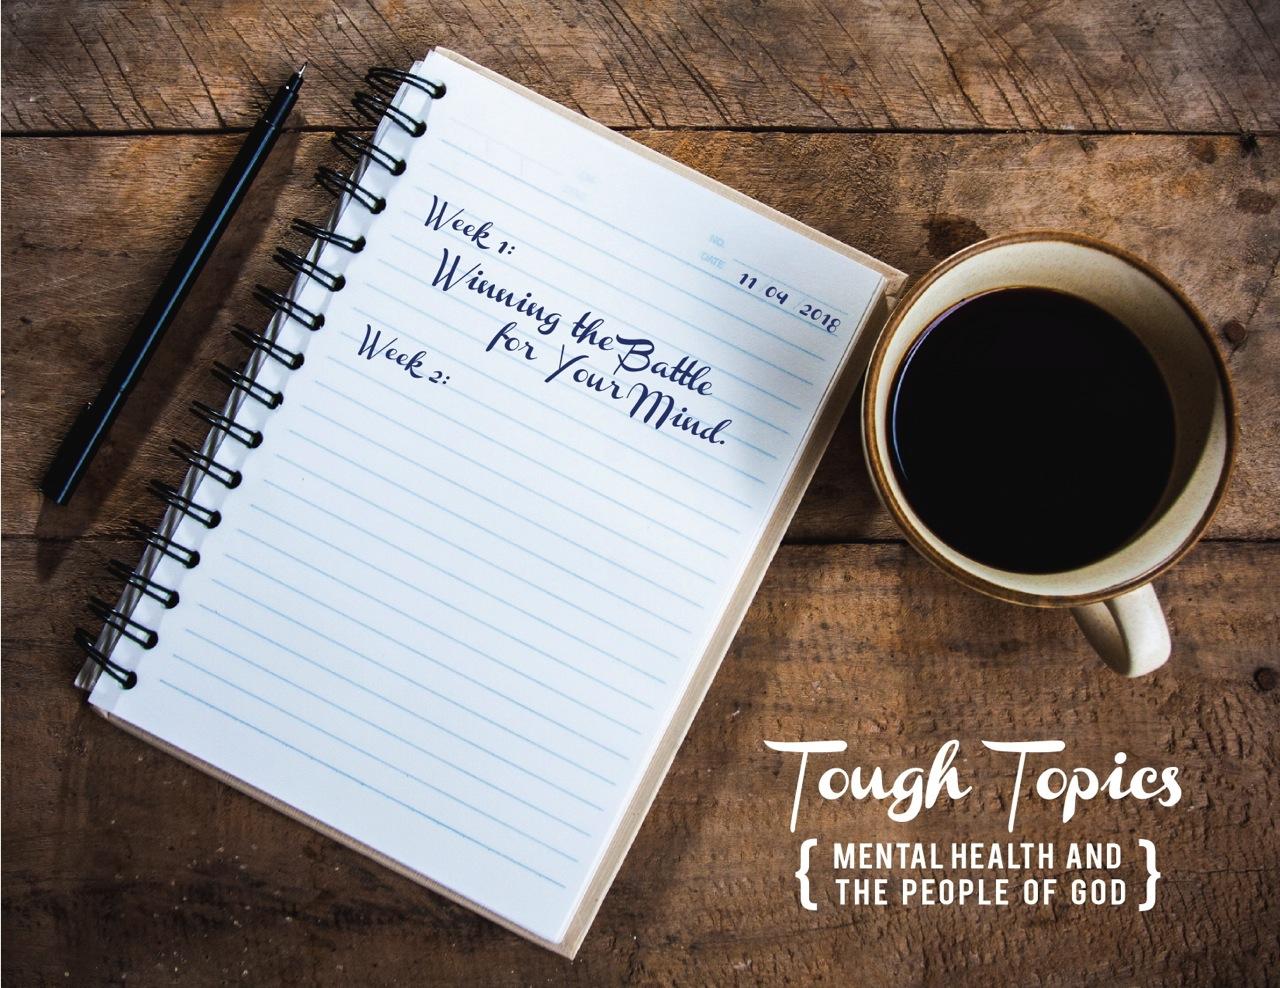 2018 Tough Topics PPT Cover Slide_Week 1.jpg